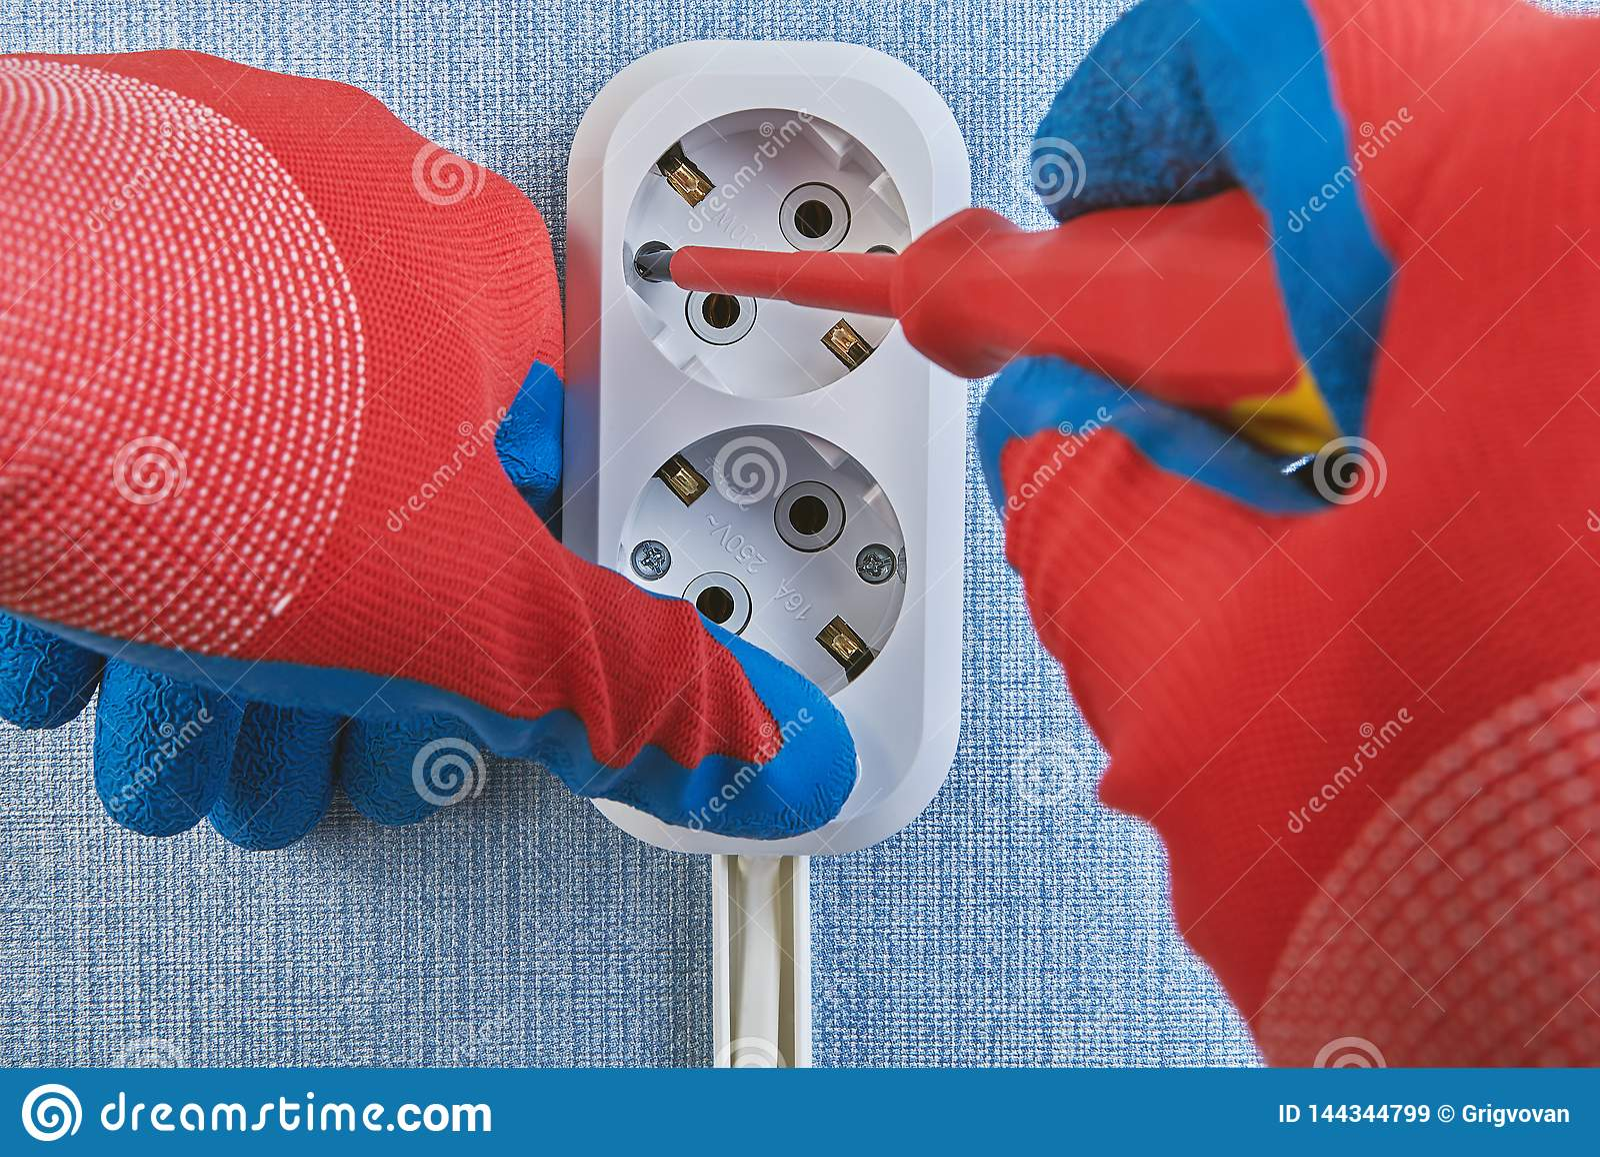 Strange Electrical Wiring Installation Twisting Screws Of Outlet Stock Wiring Digital Resources Bemuashebarightsorg